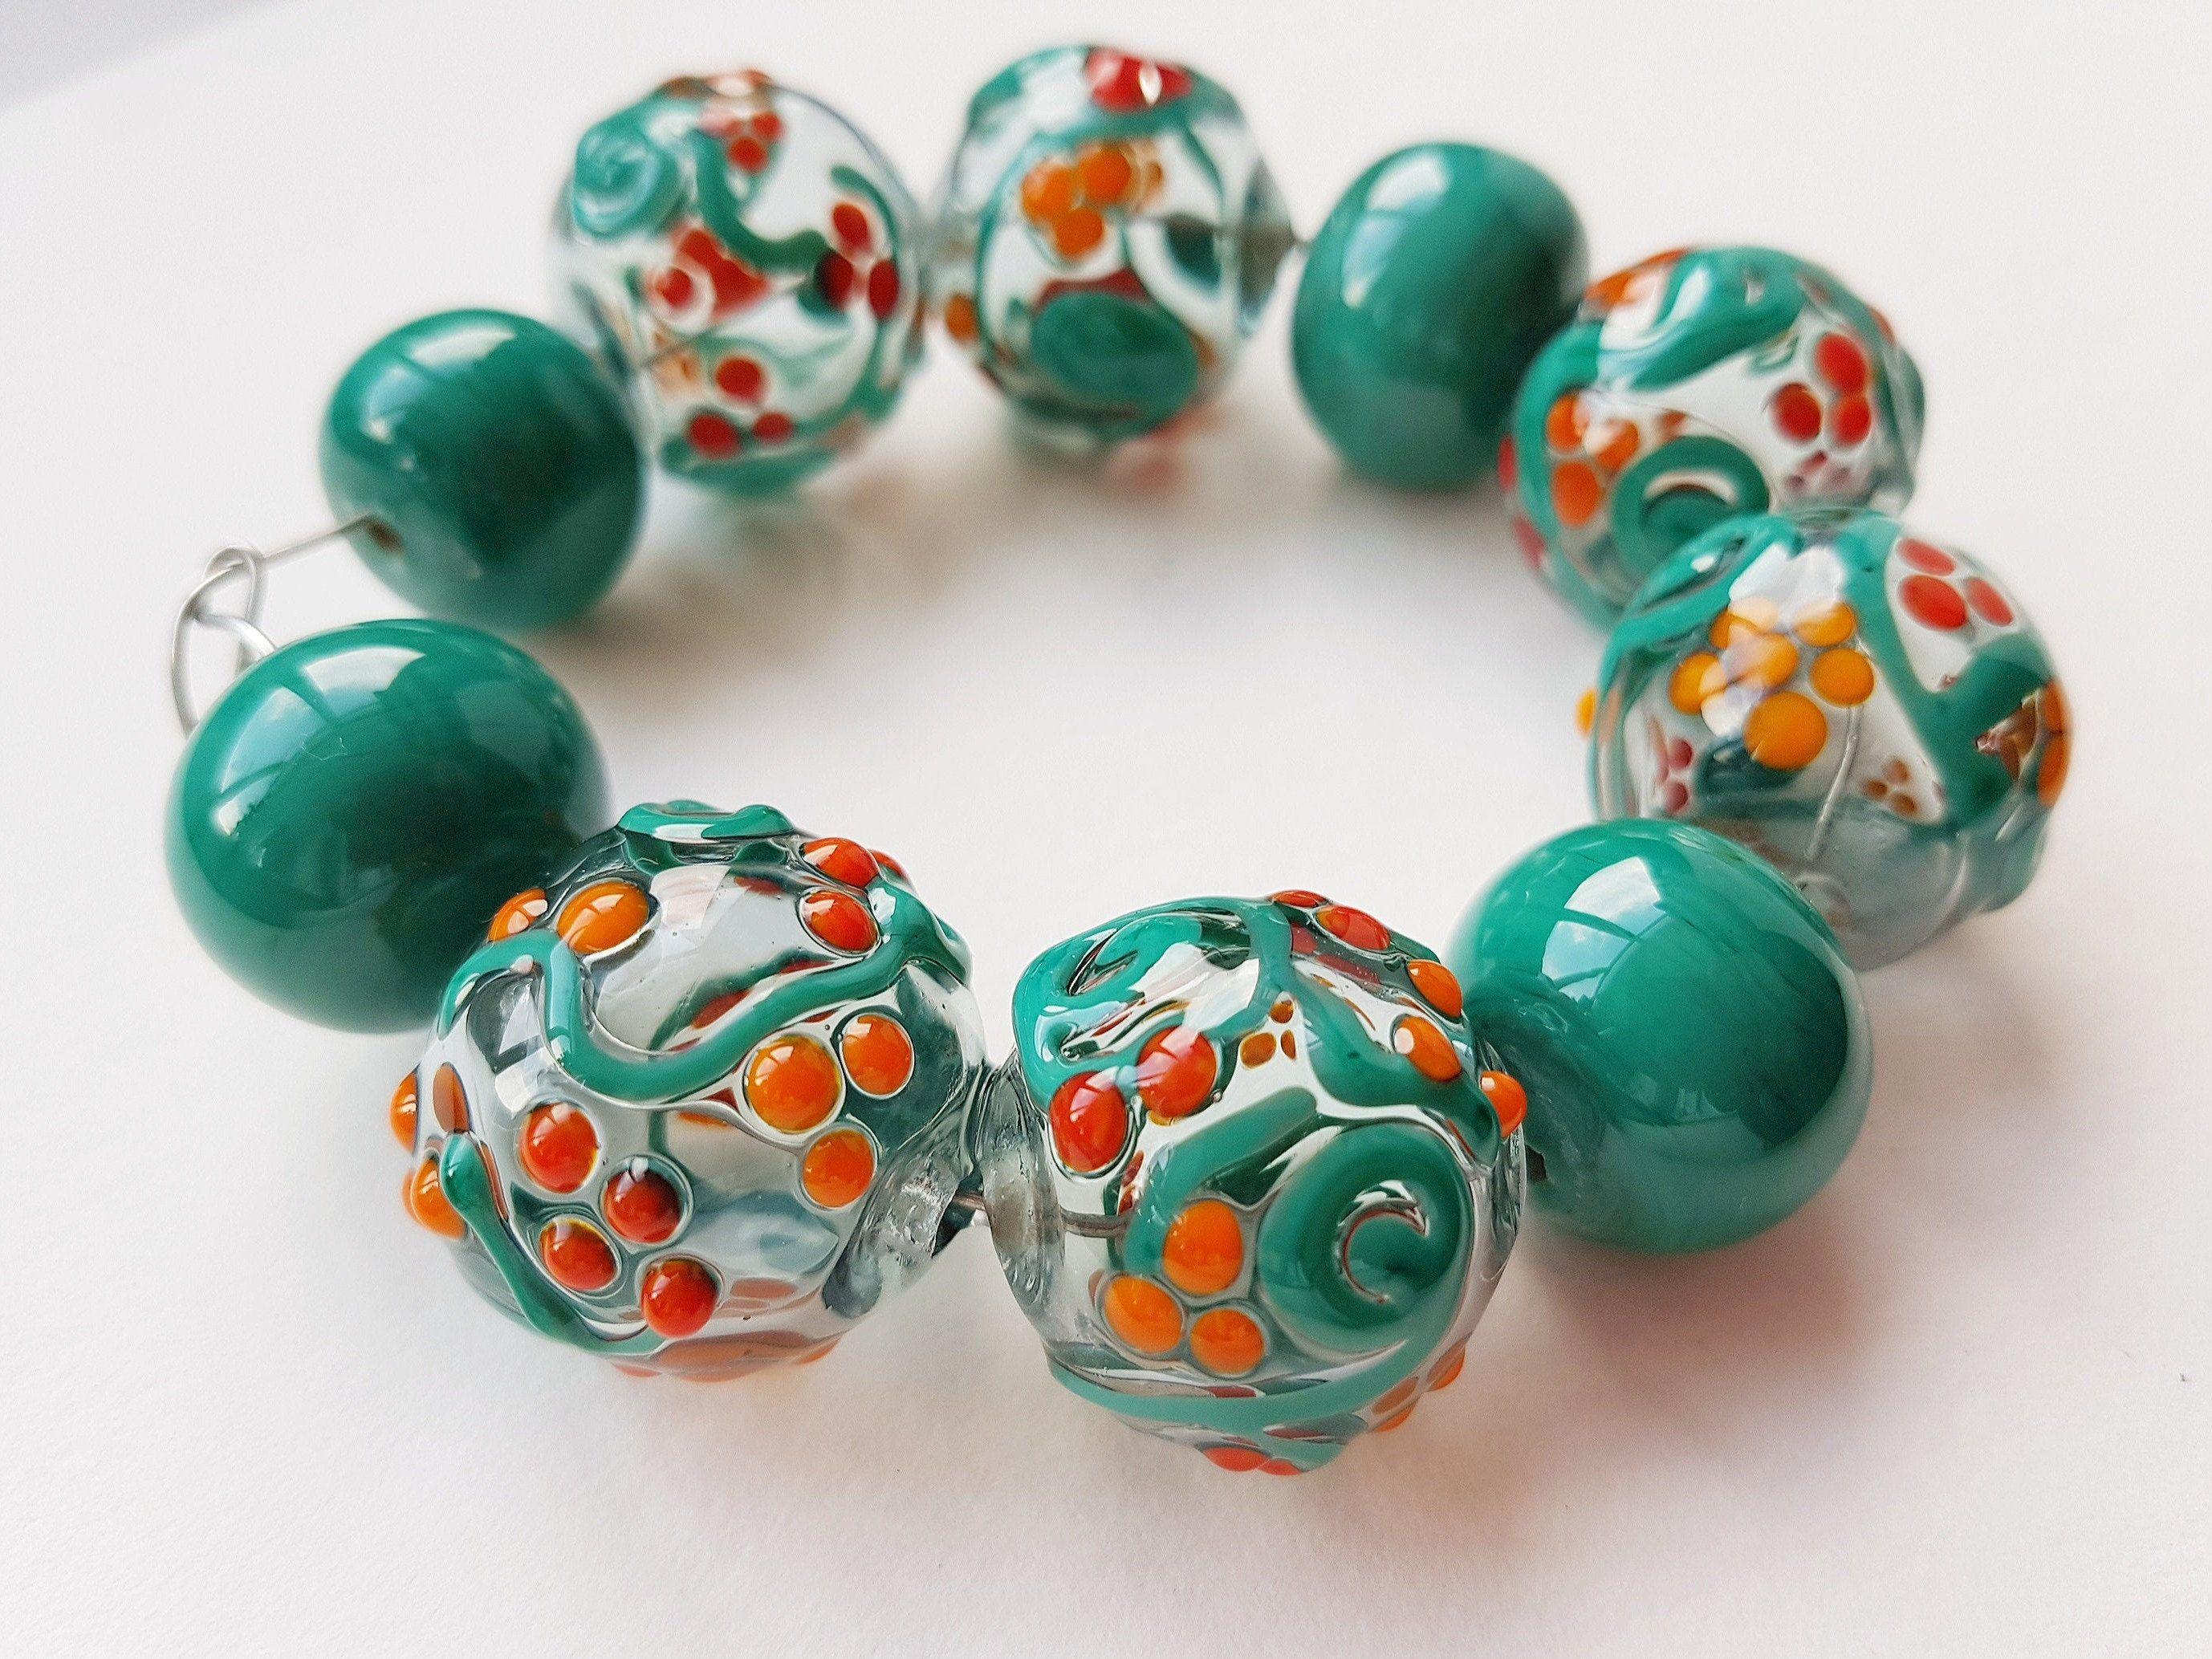 Lampwork beads Blown beads Craft. Handmade Glass Hollow Beads For Necklace Glass Beads Handmade